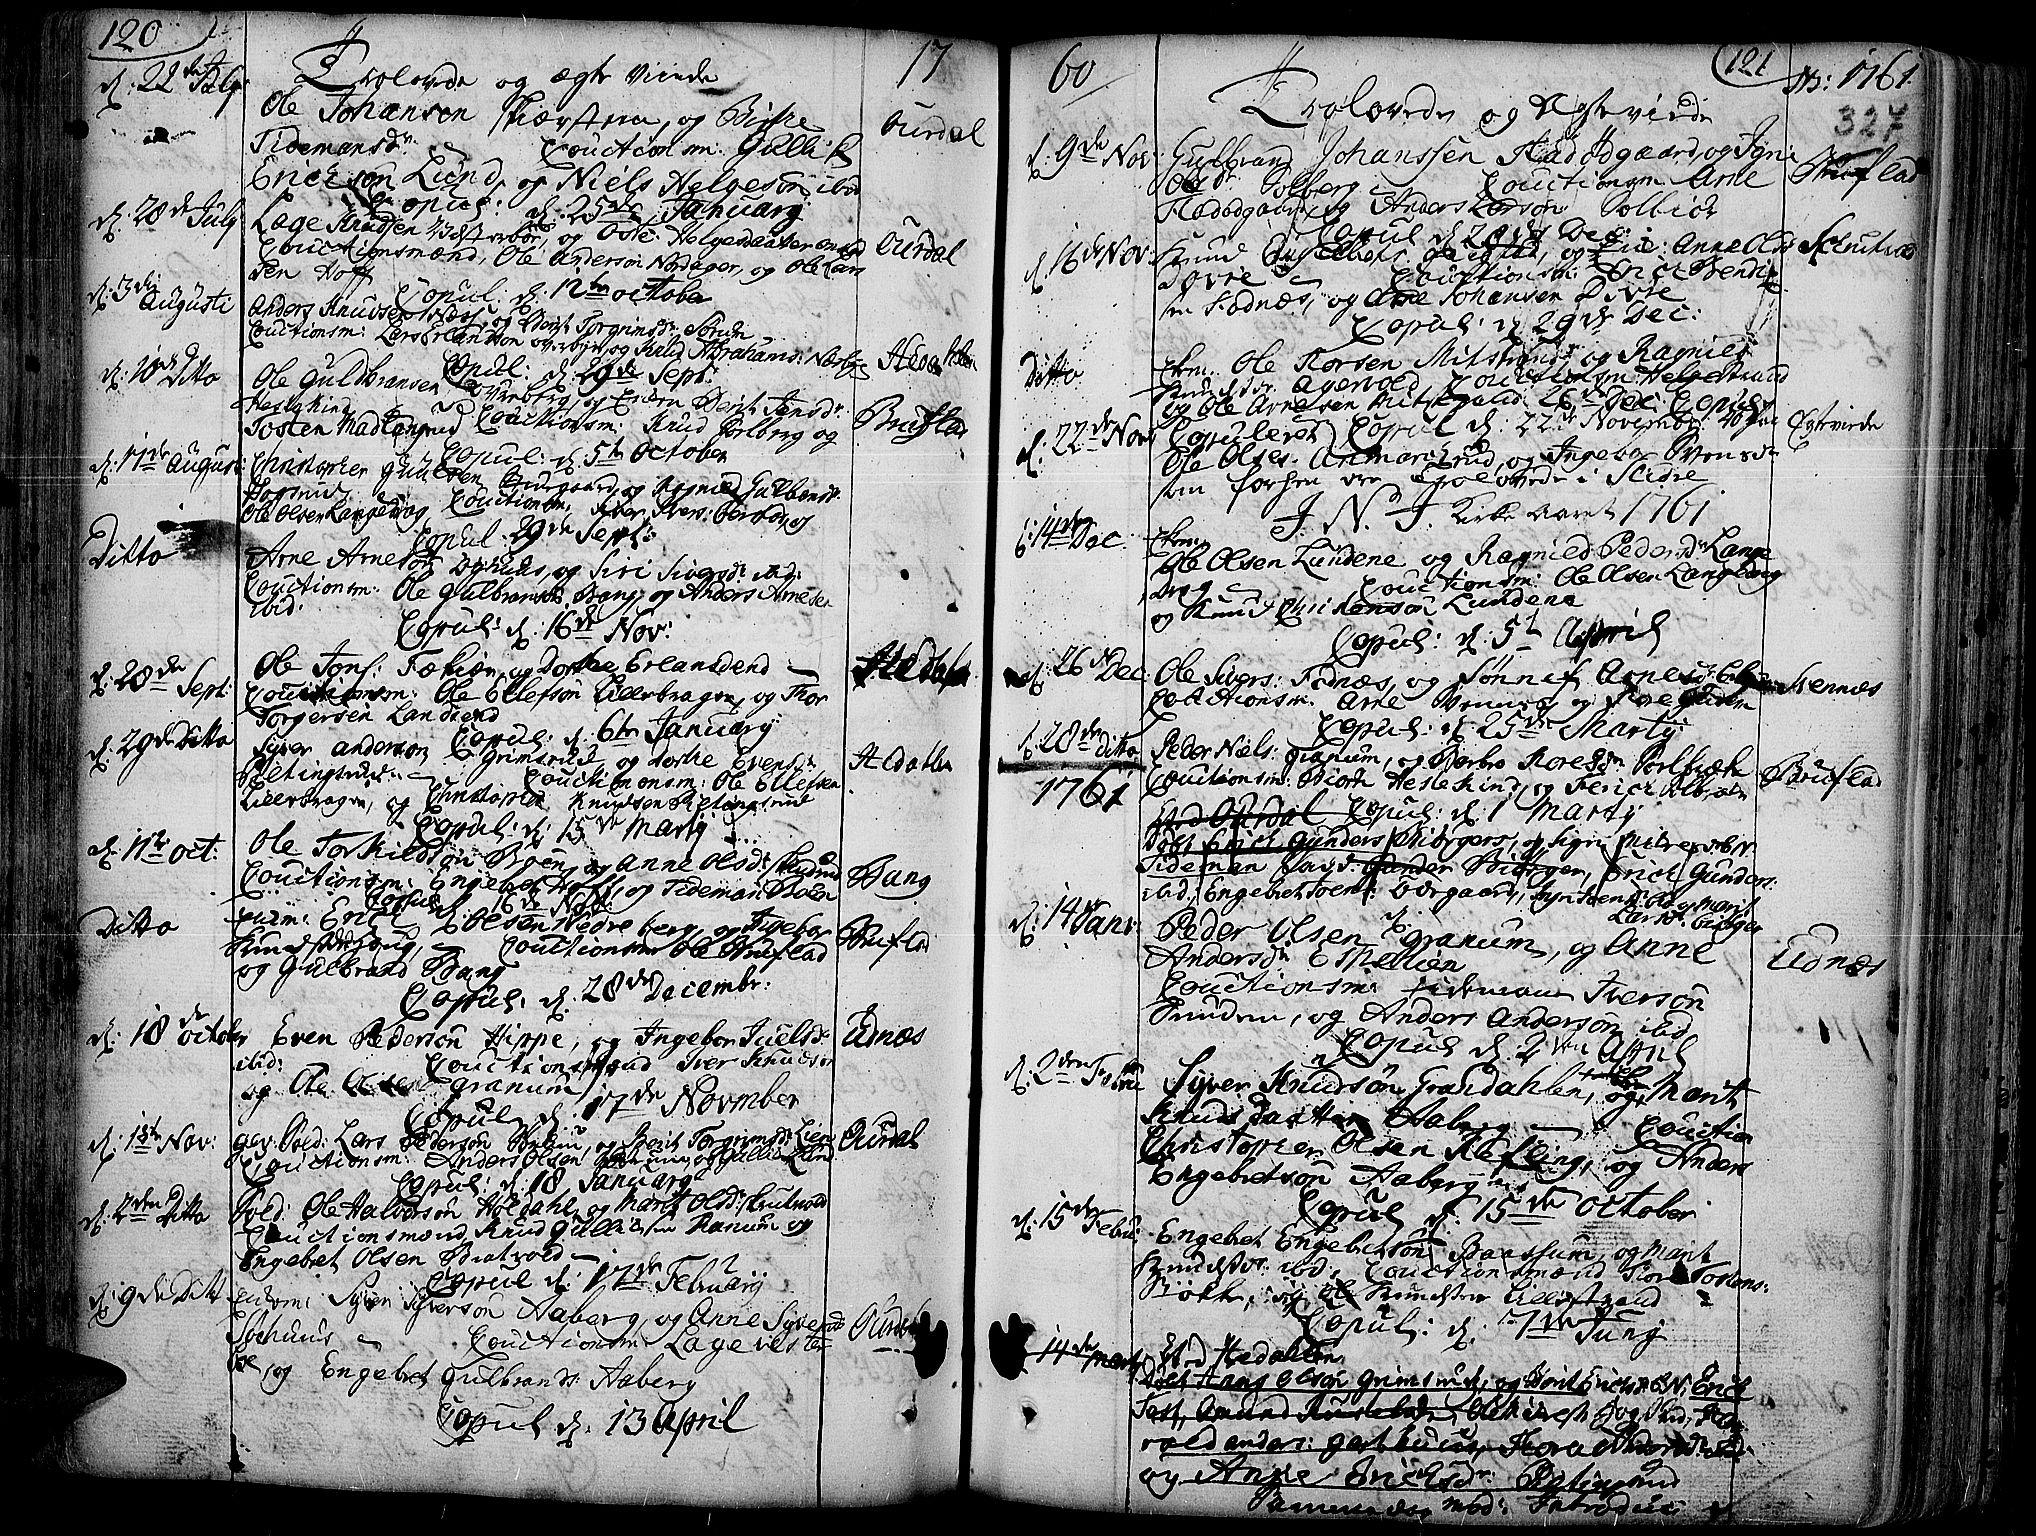 SAH, Aurdal prestekontor, Ministerialbok nr. 4, 1730-1762, s. 120-121